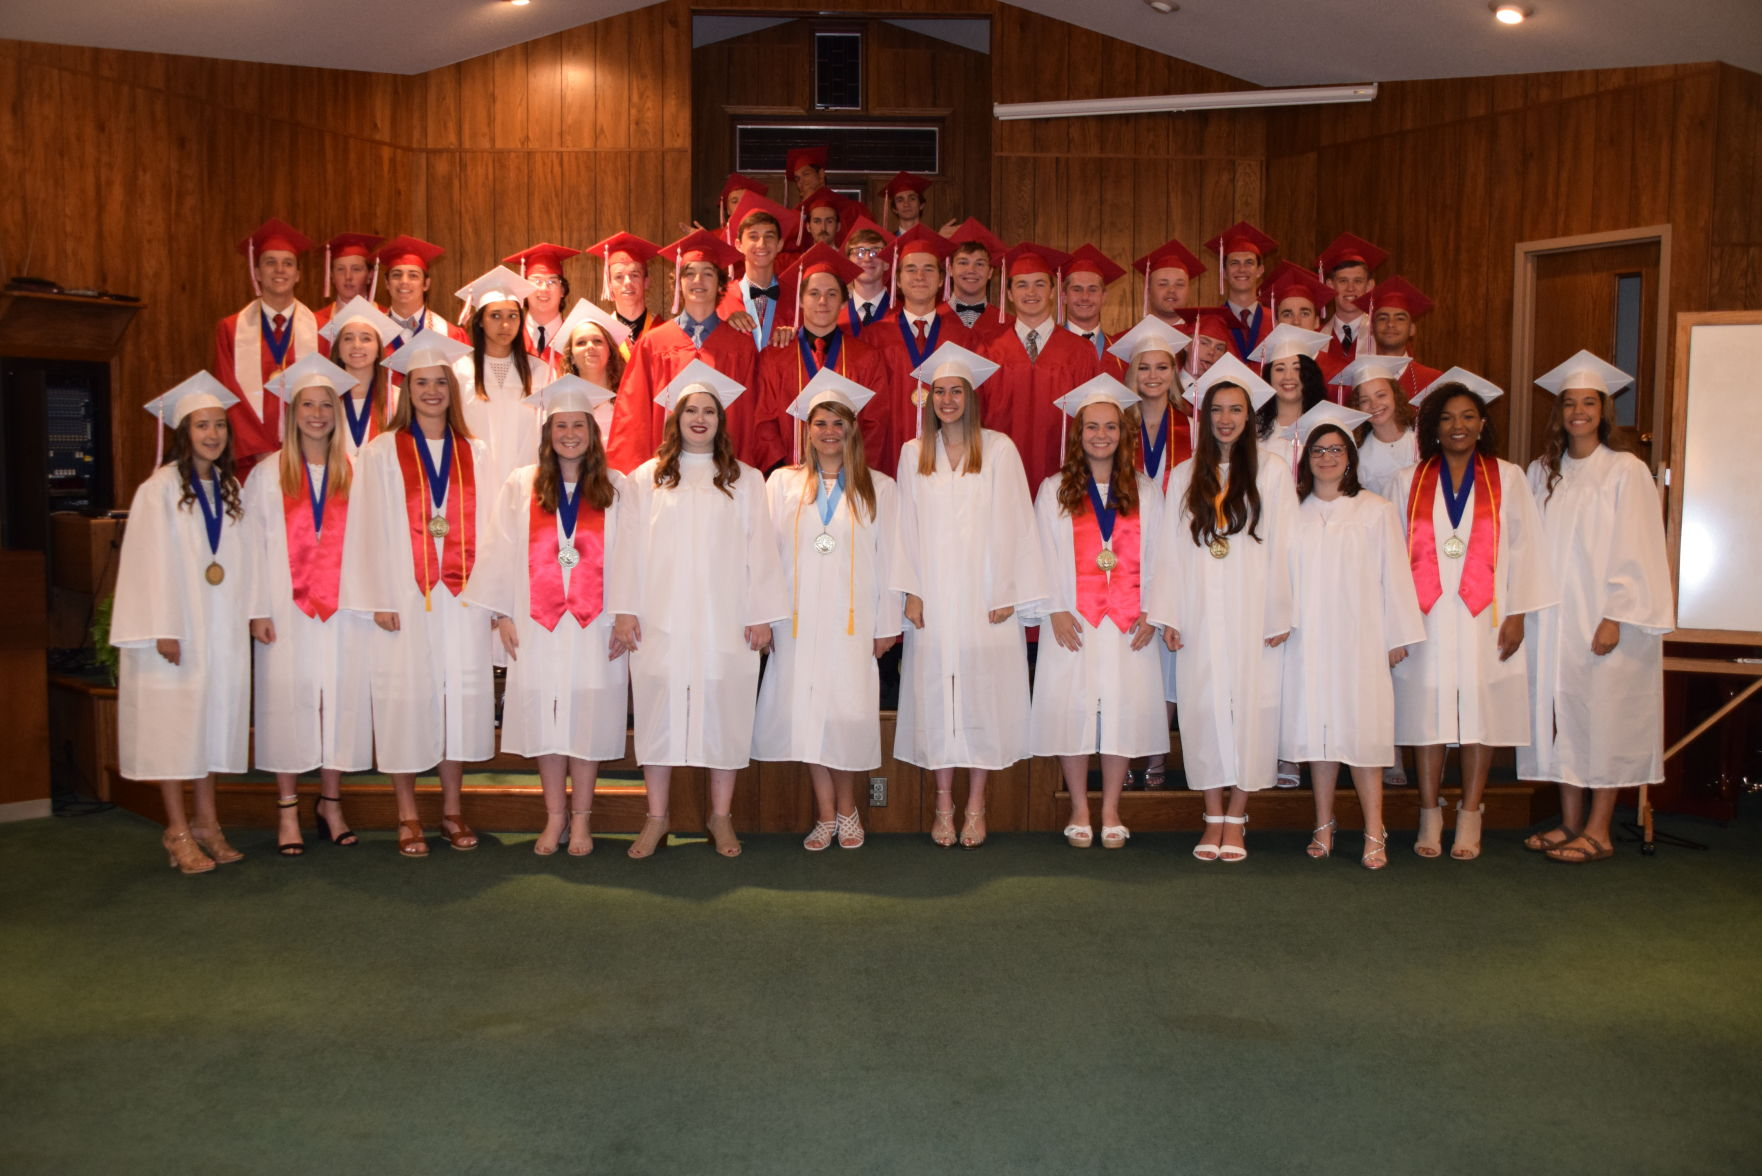 GALLERY: Mansfield Christian Graduation 2019